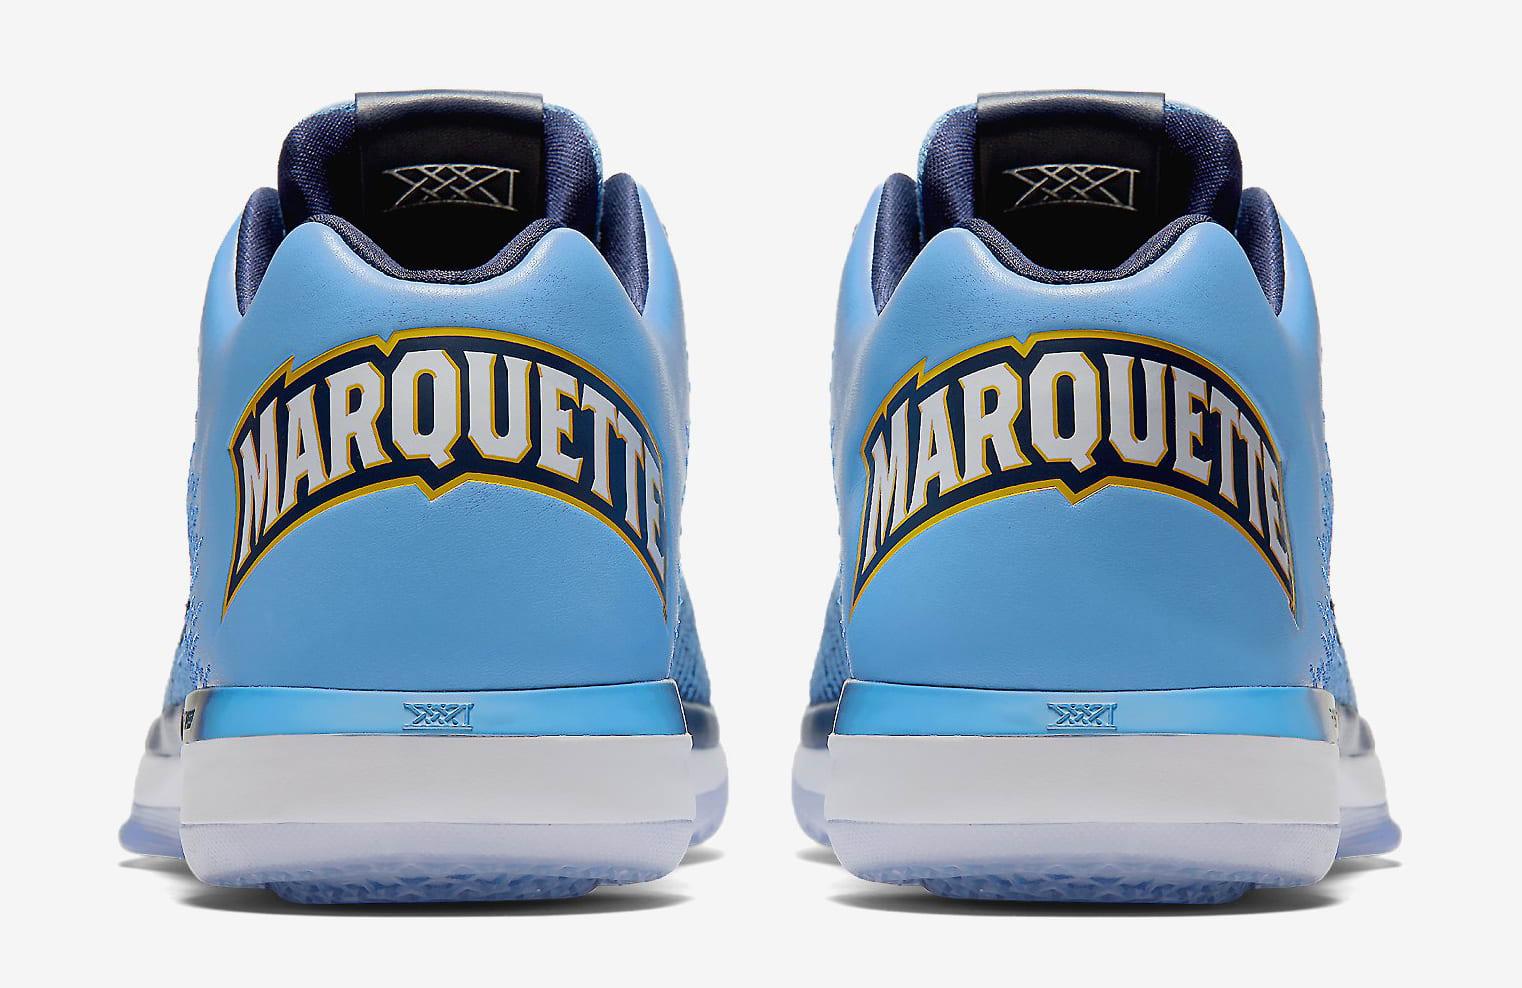 Marquette Air Jordan 31 Heel